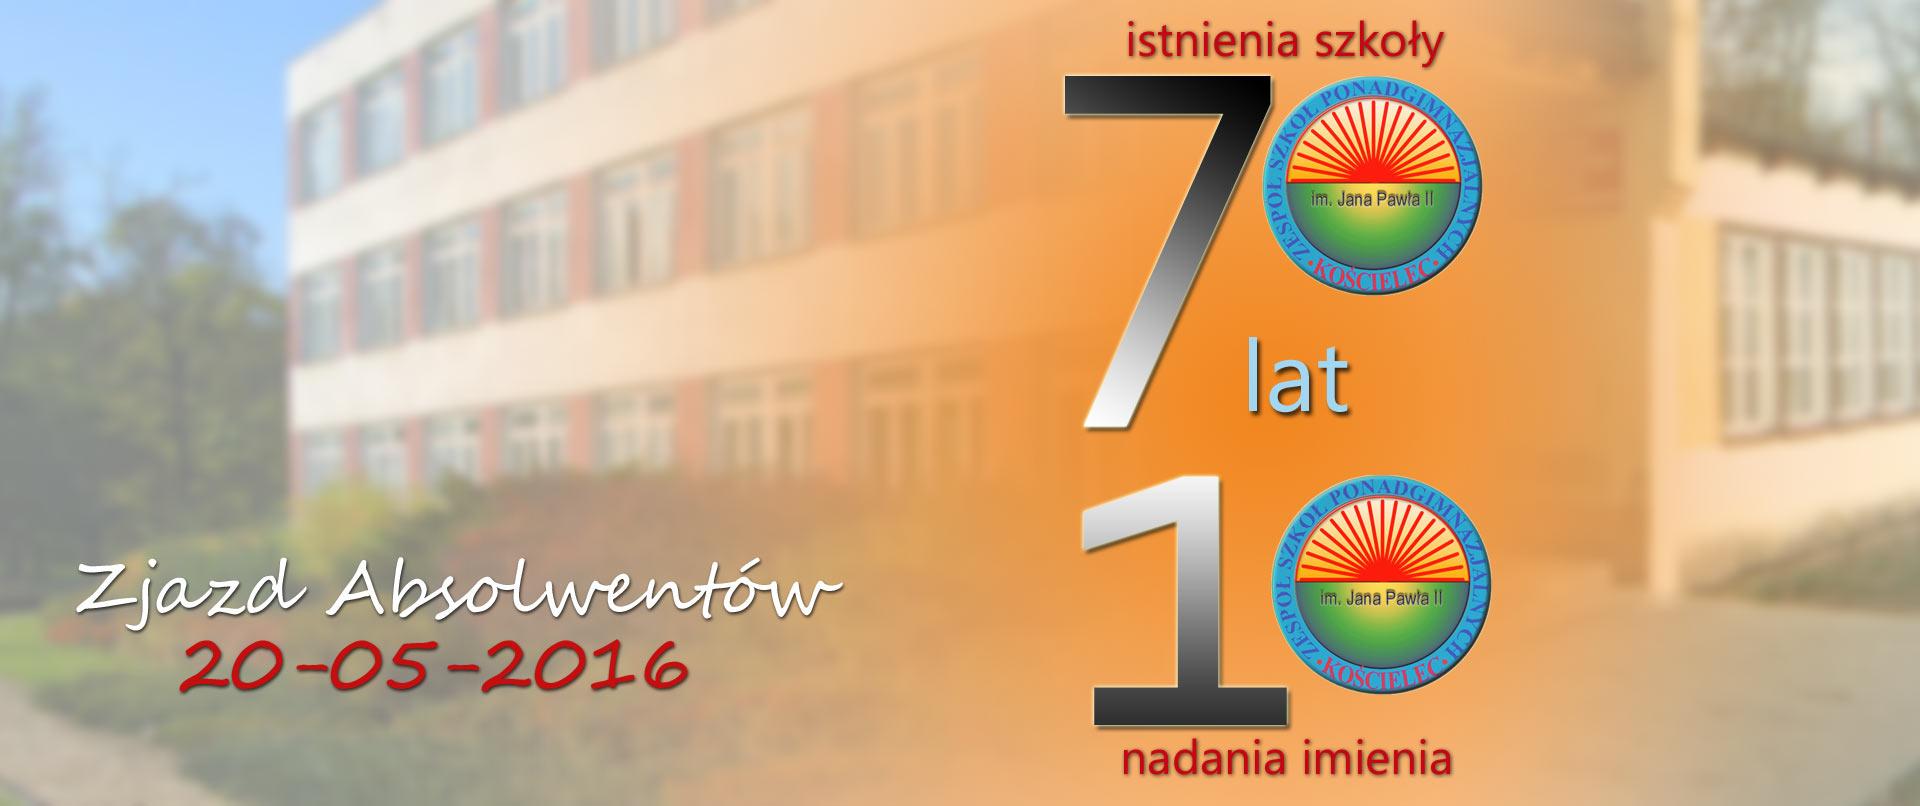 zsp-slide6-zjazd